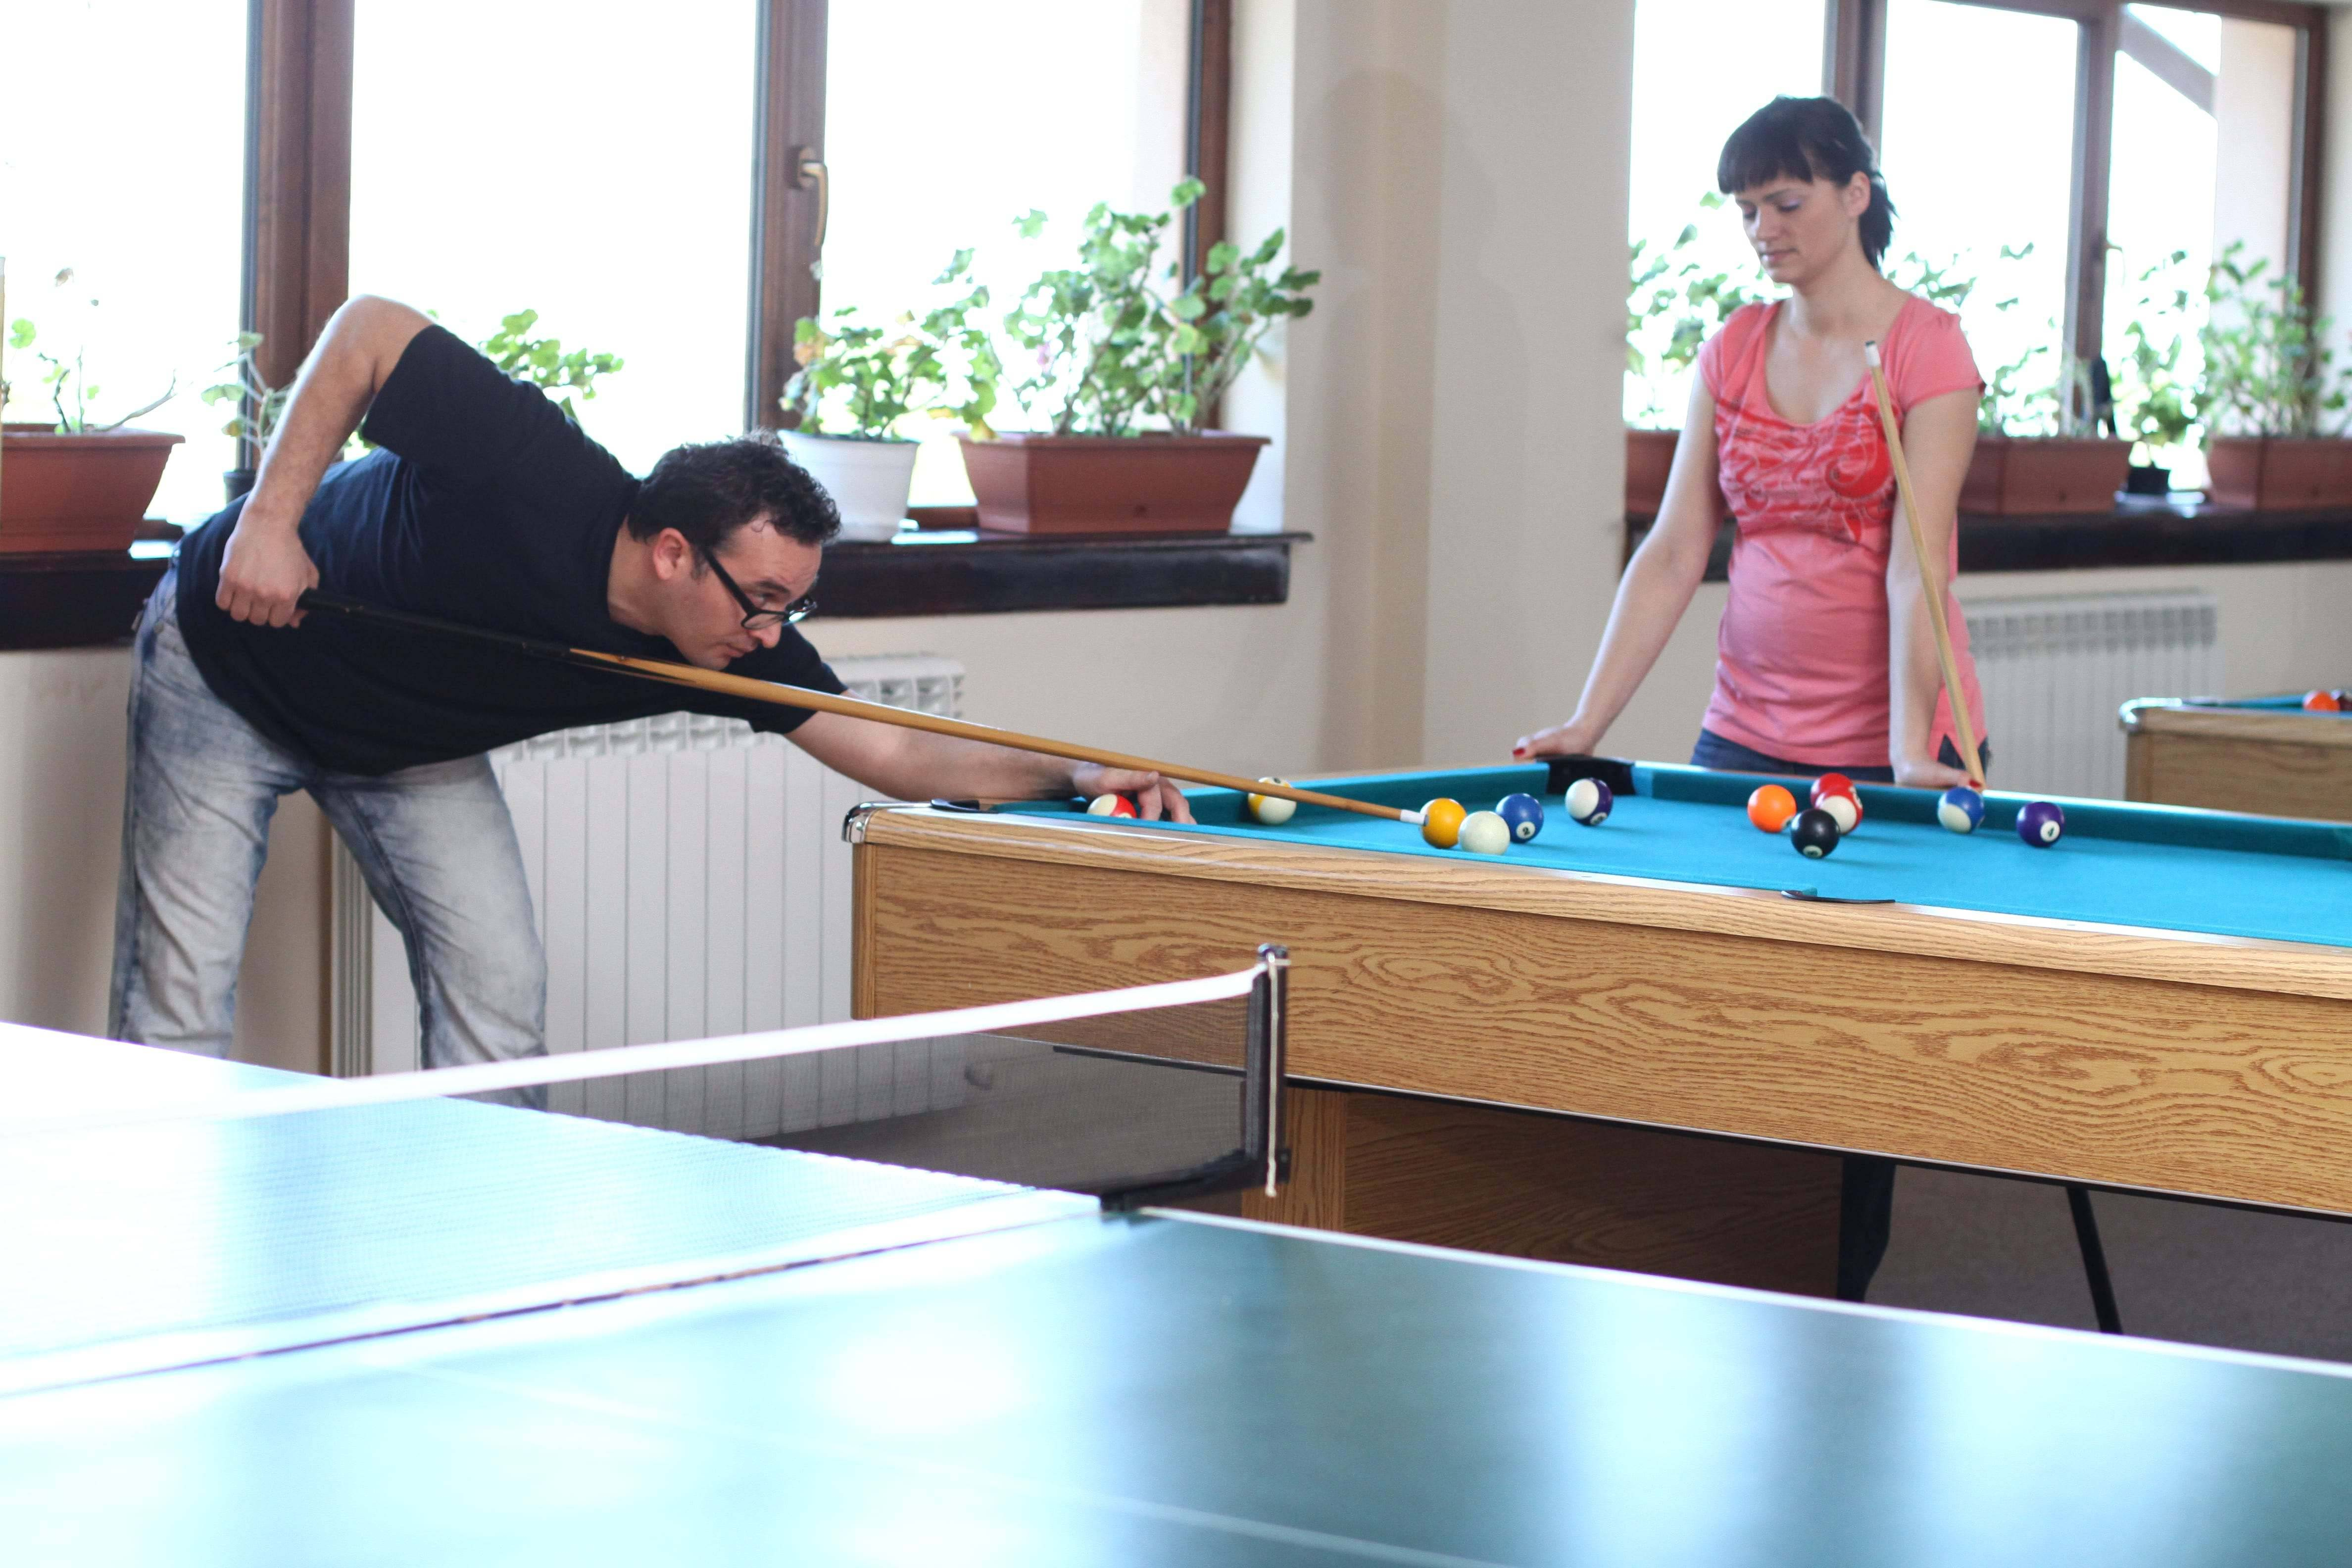 jocuri ping pong fotbal biliard ieftin cazare baisoara pensiune skiland munte